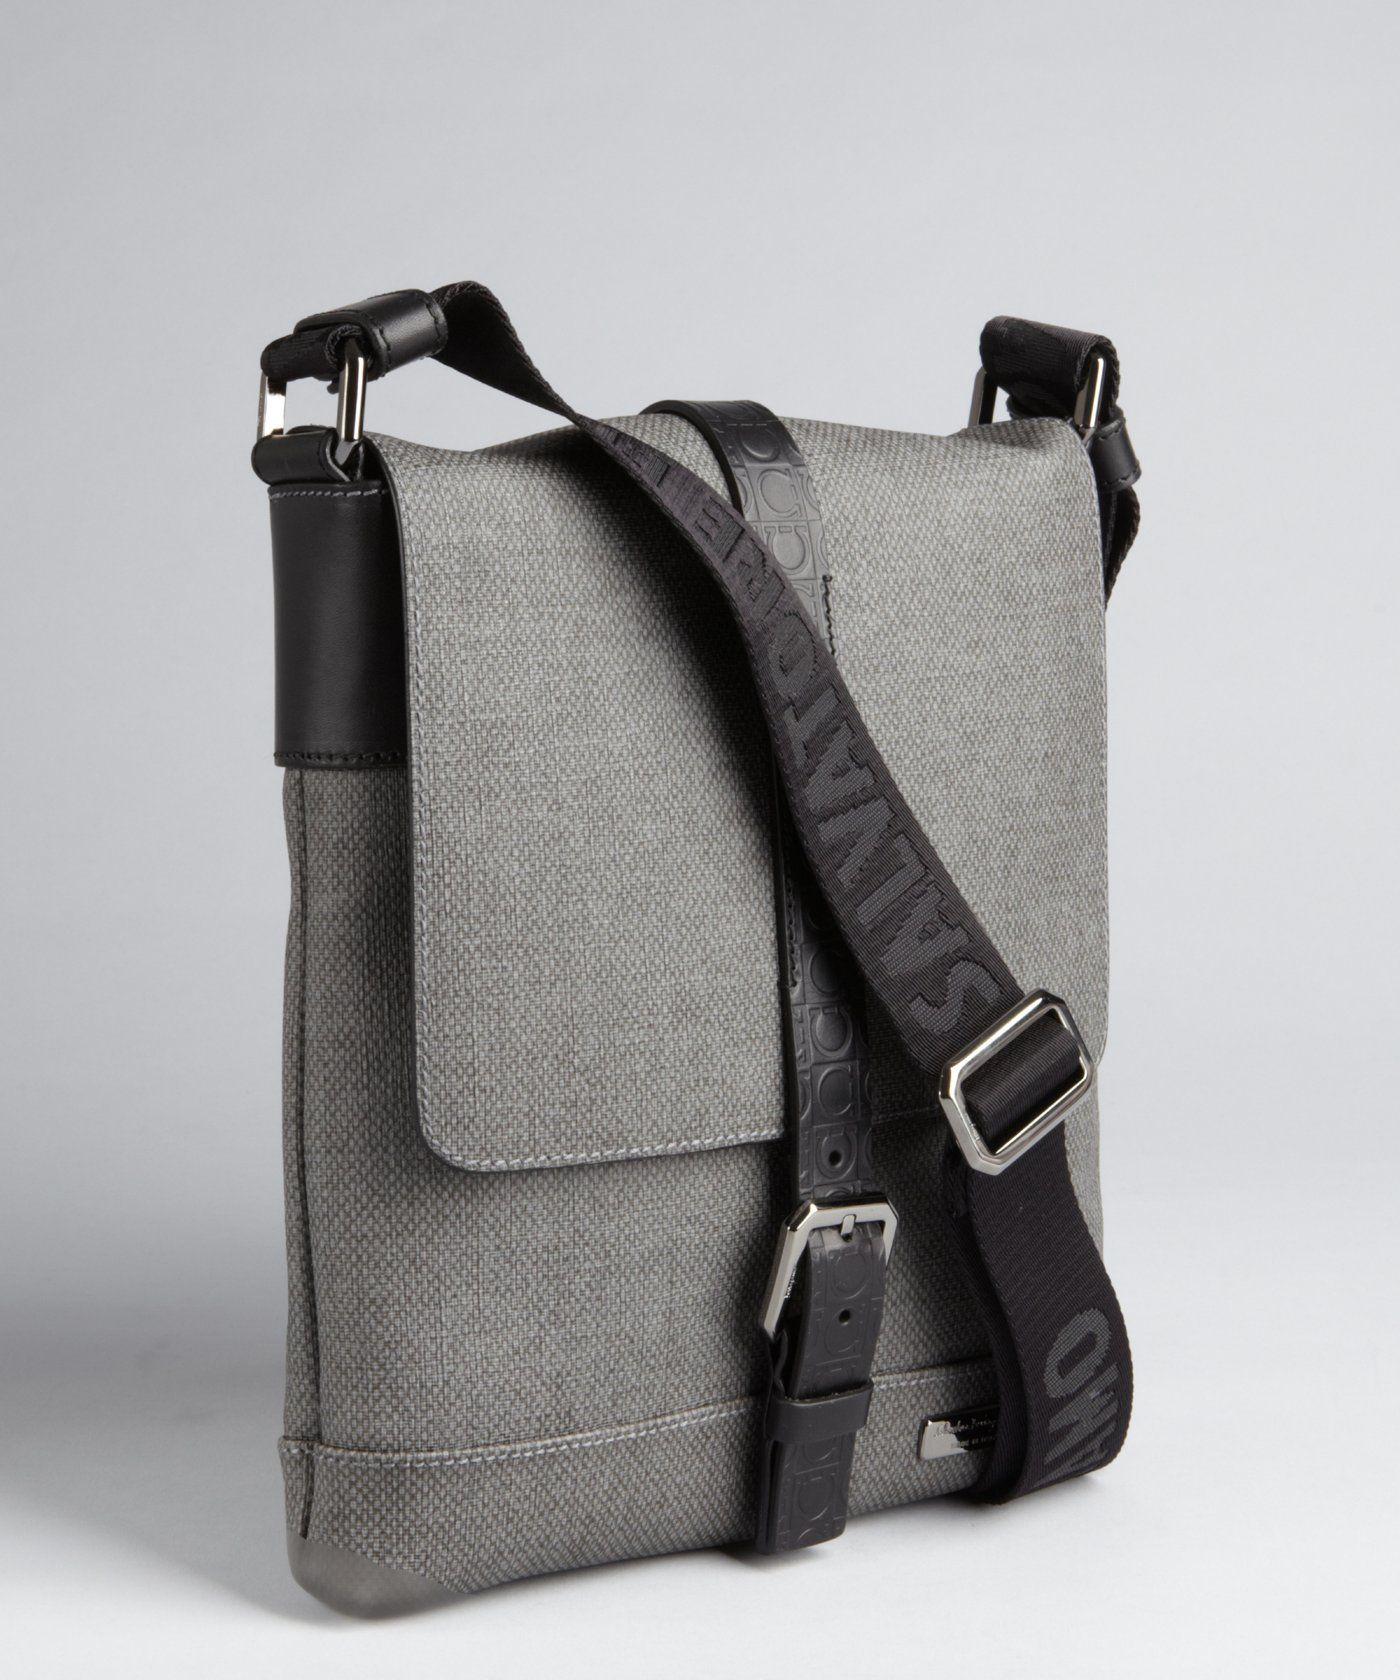 Salvatore Ferragamo grey coated canvas map case small messenger bag ... f37cf23fc0dff